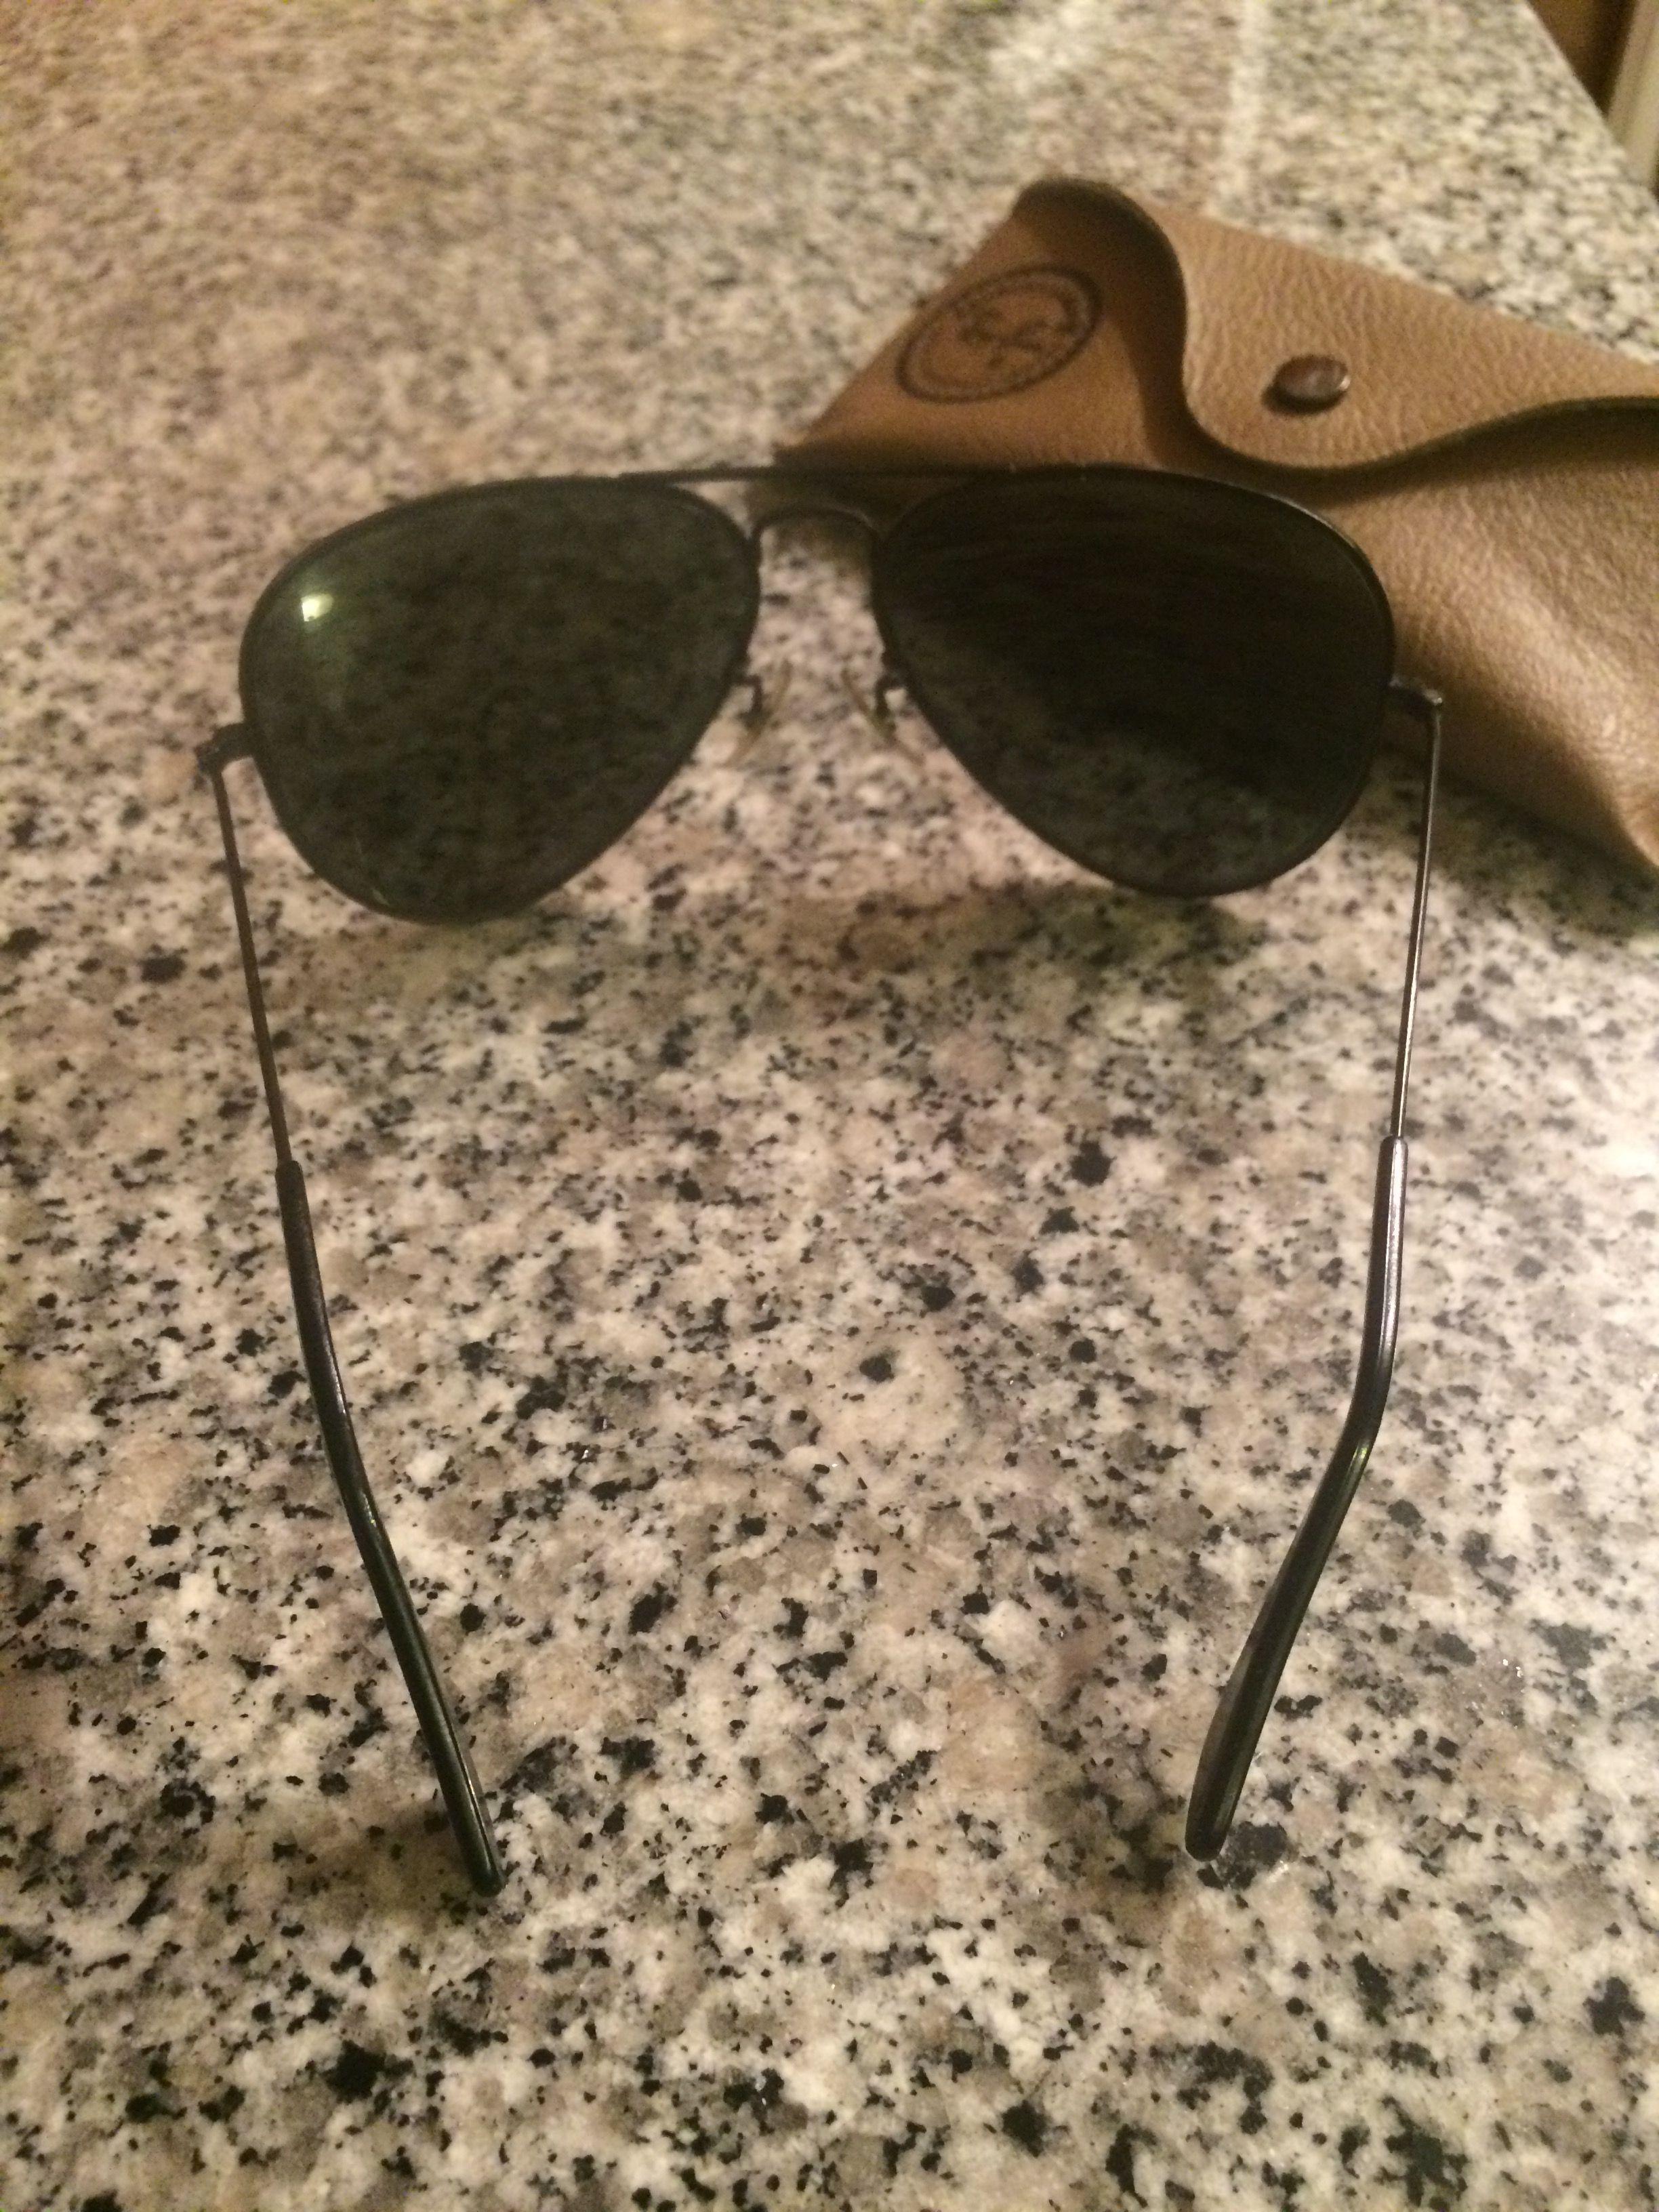 Sunglasses MEGATHREAD - all sunglass questions here please